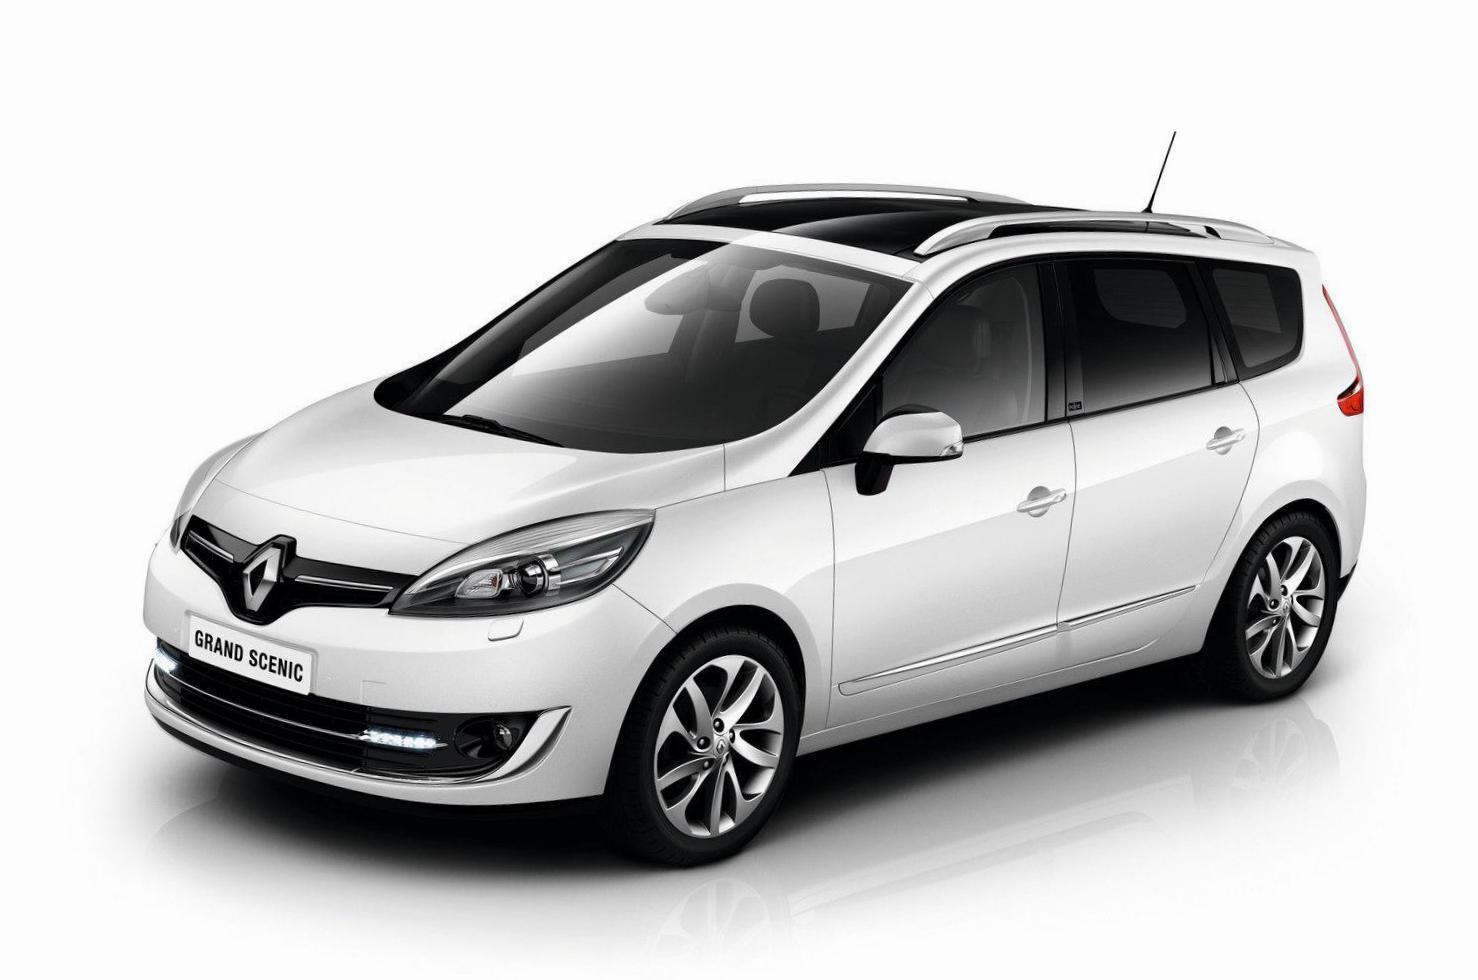 Scenic Renault Configuration Http Autotras Com Scenic Renault Renault New Renault